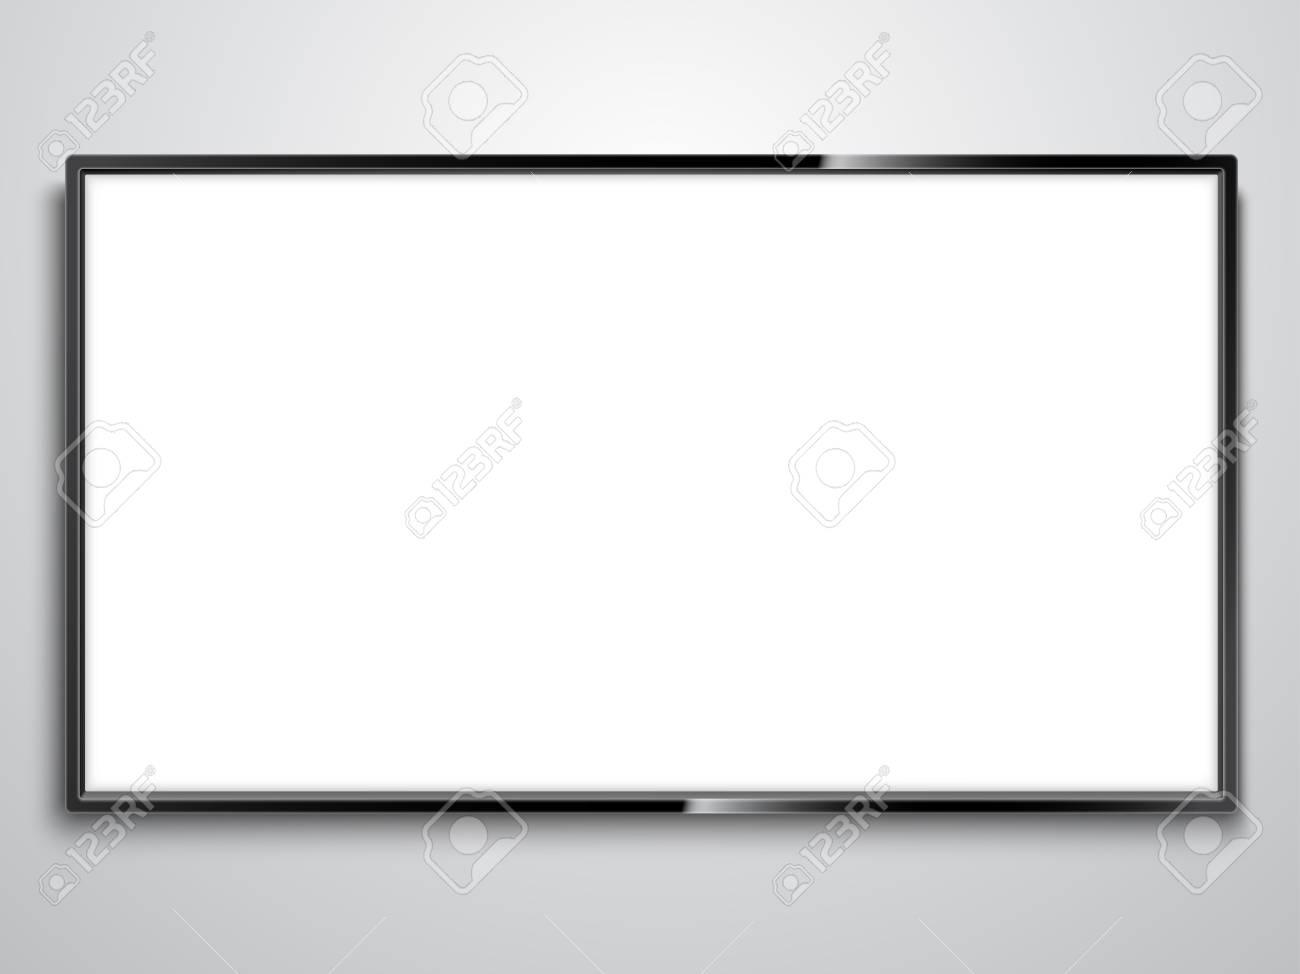 White Screen TV illustration on white background.. - 99865391